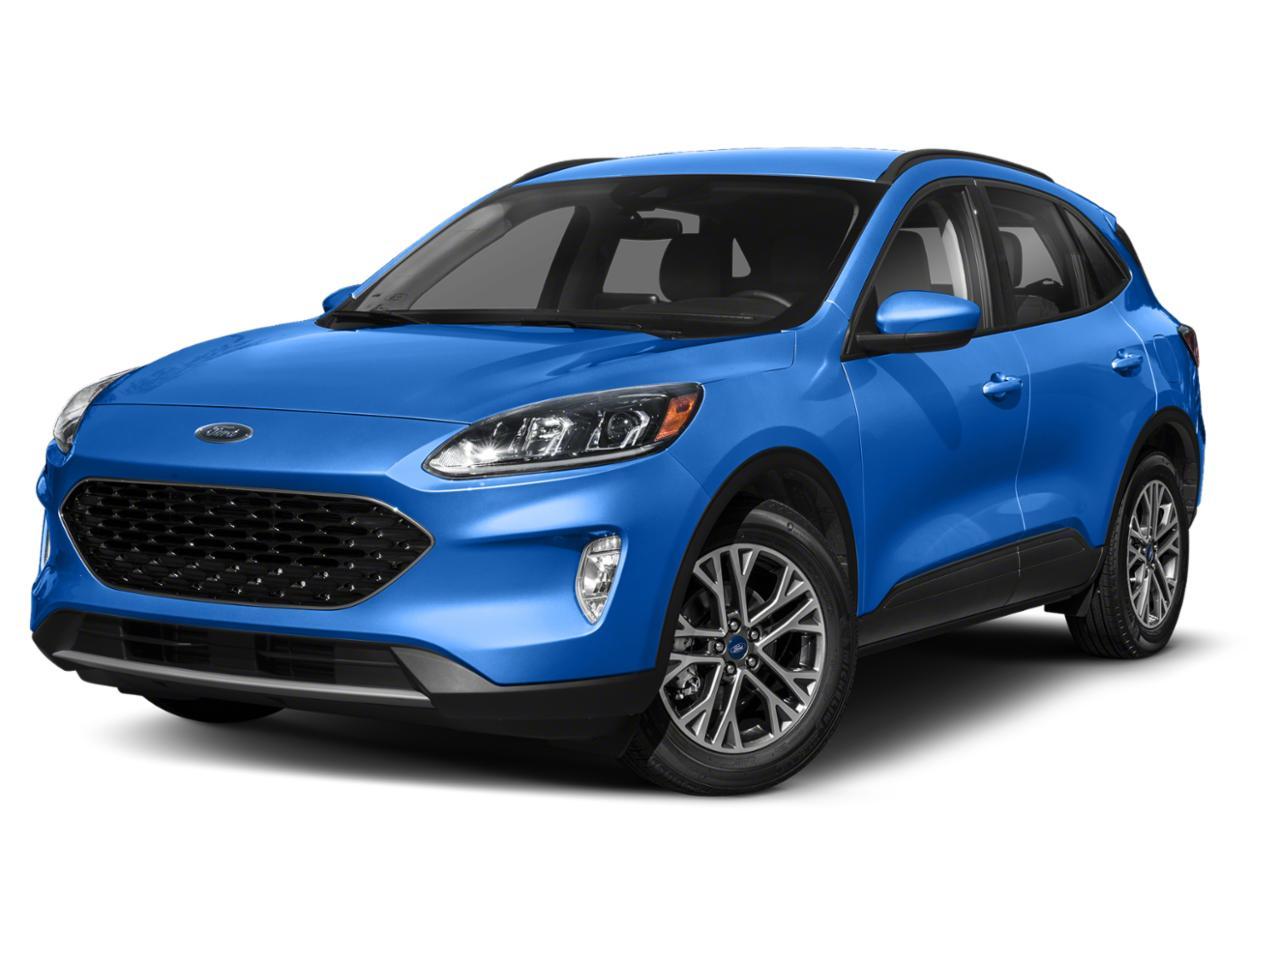 2021 Ford Escape Kingwood WV